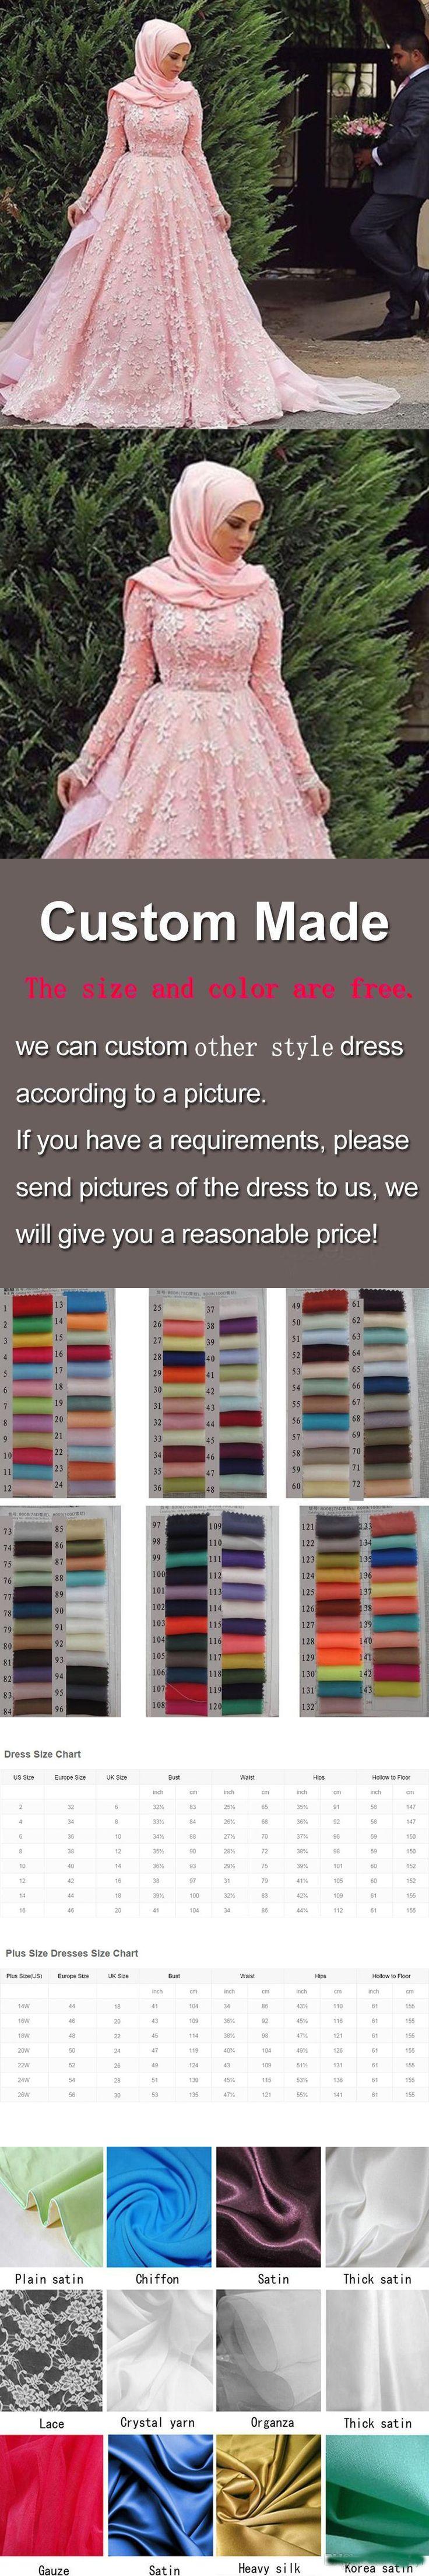 Muslim hijab Wedding Dresses 2016 Elegant A Line Pink Applique Lace Long Sleeve Long Plus Size china Bridal Gowns $299